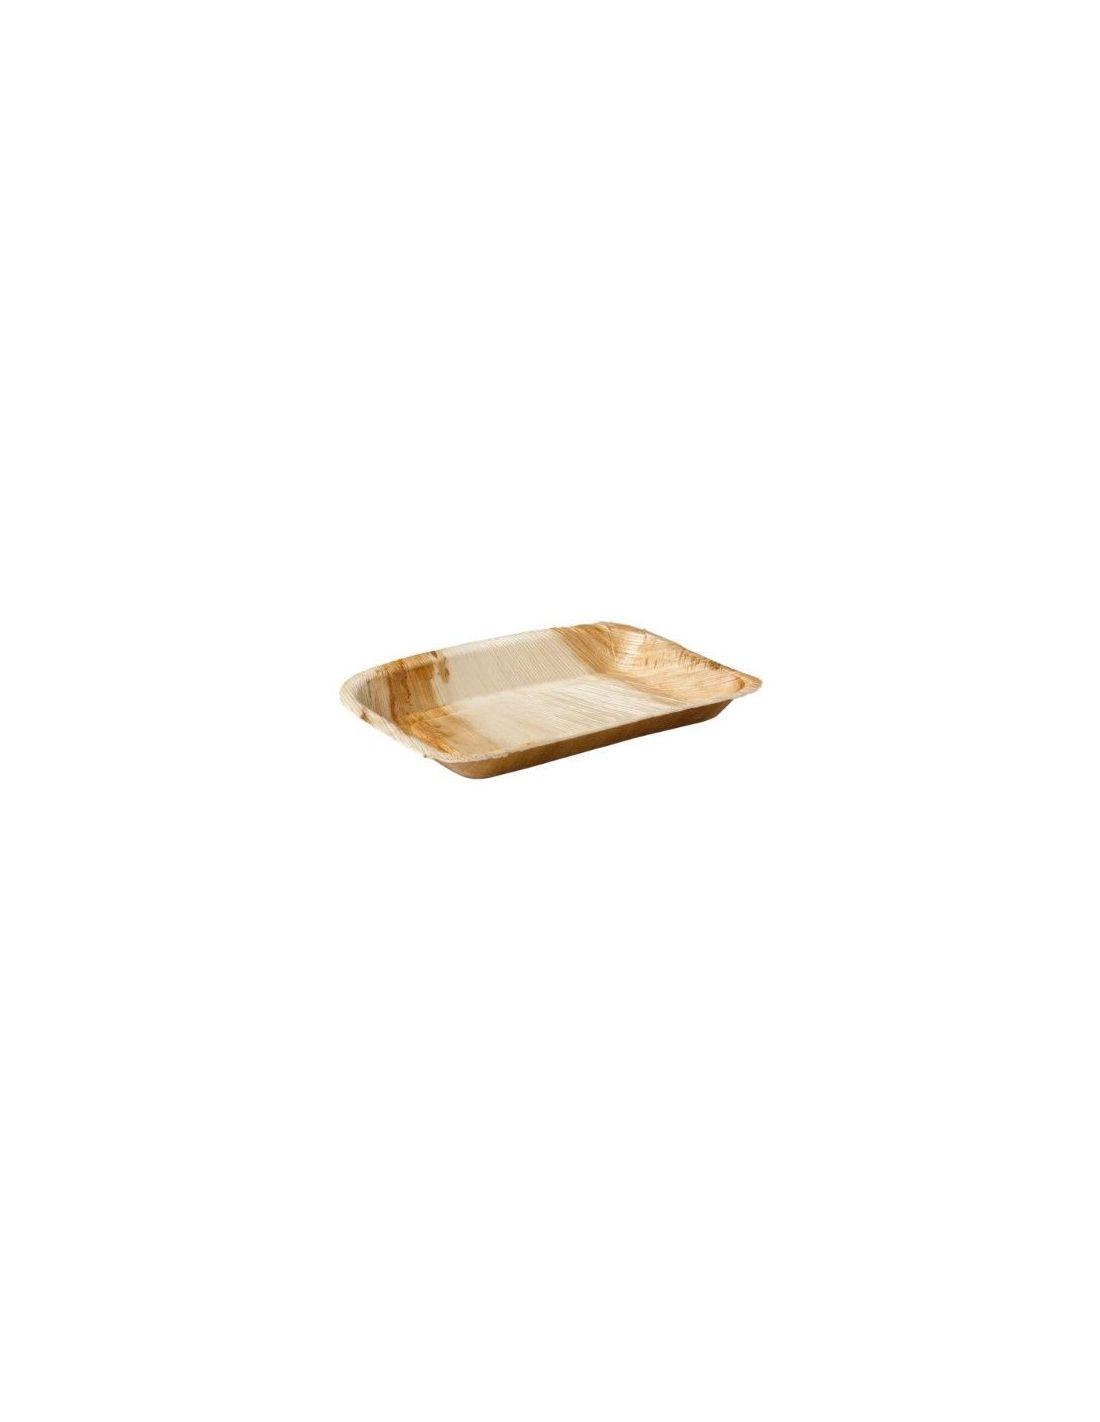 Palmilehest Ristkülikukujuline Taldrik 24 x 16 cm